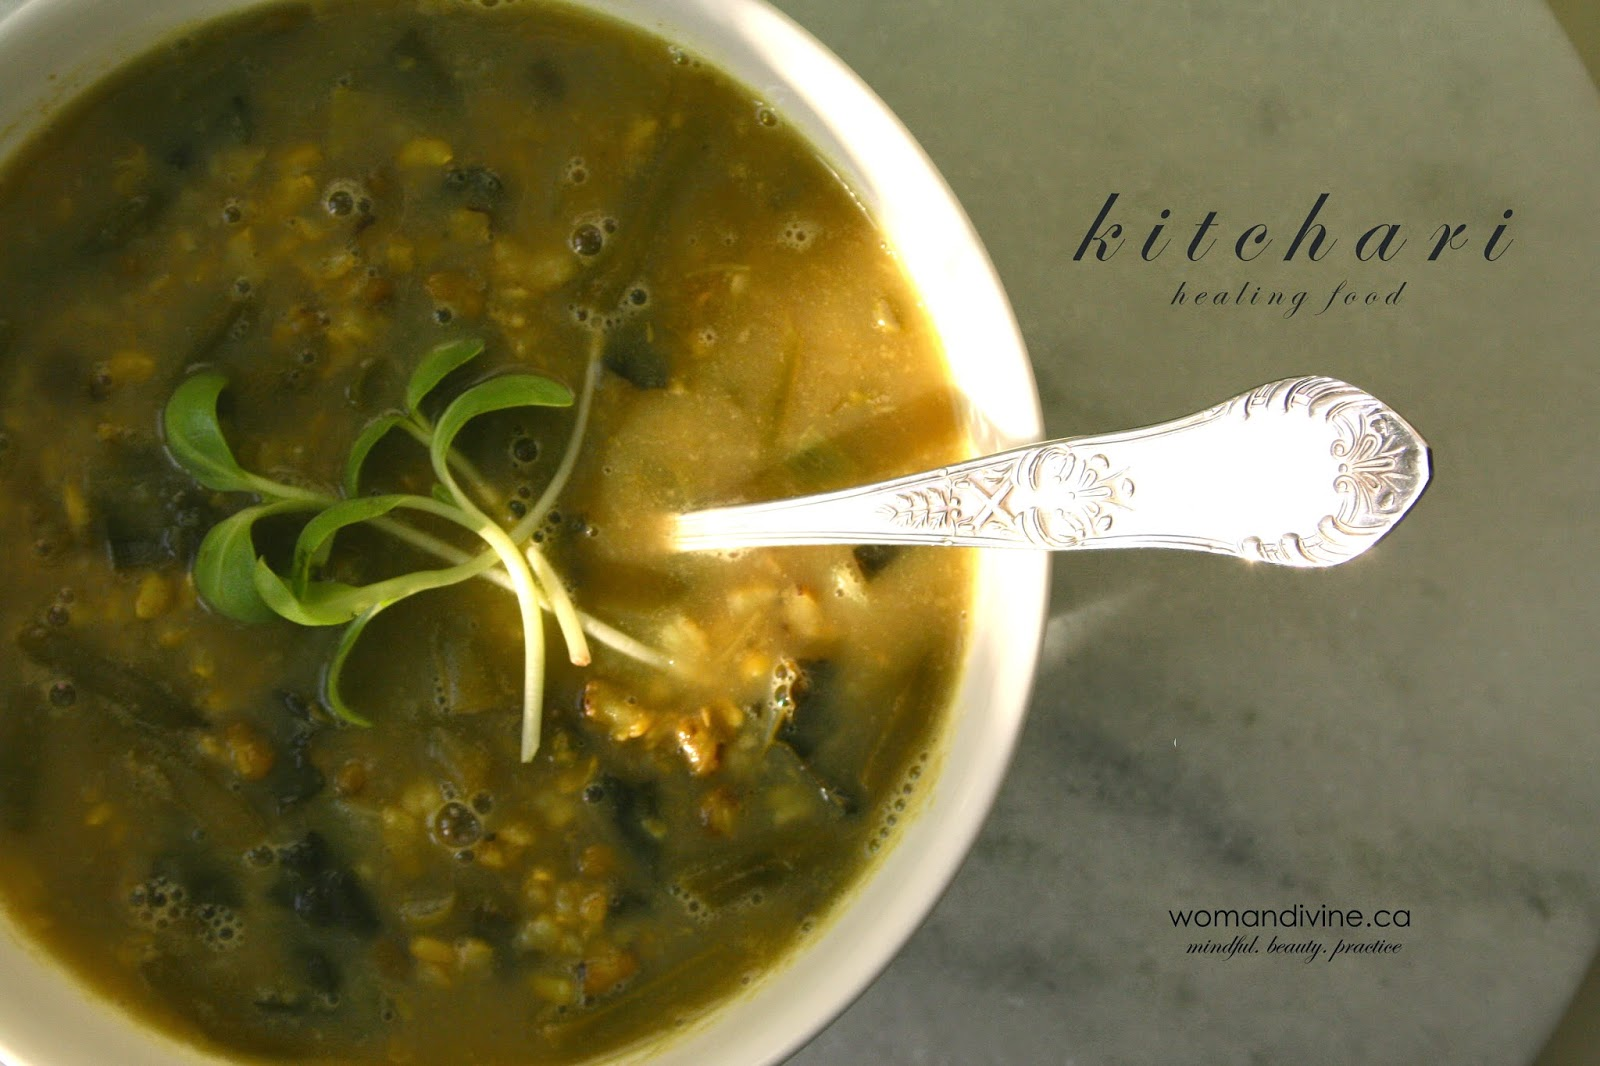 Kitchari- healing food